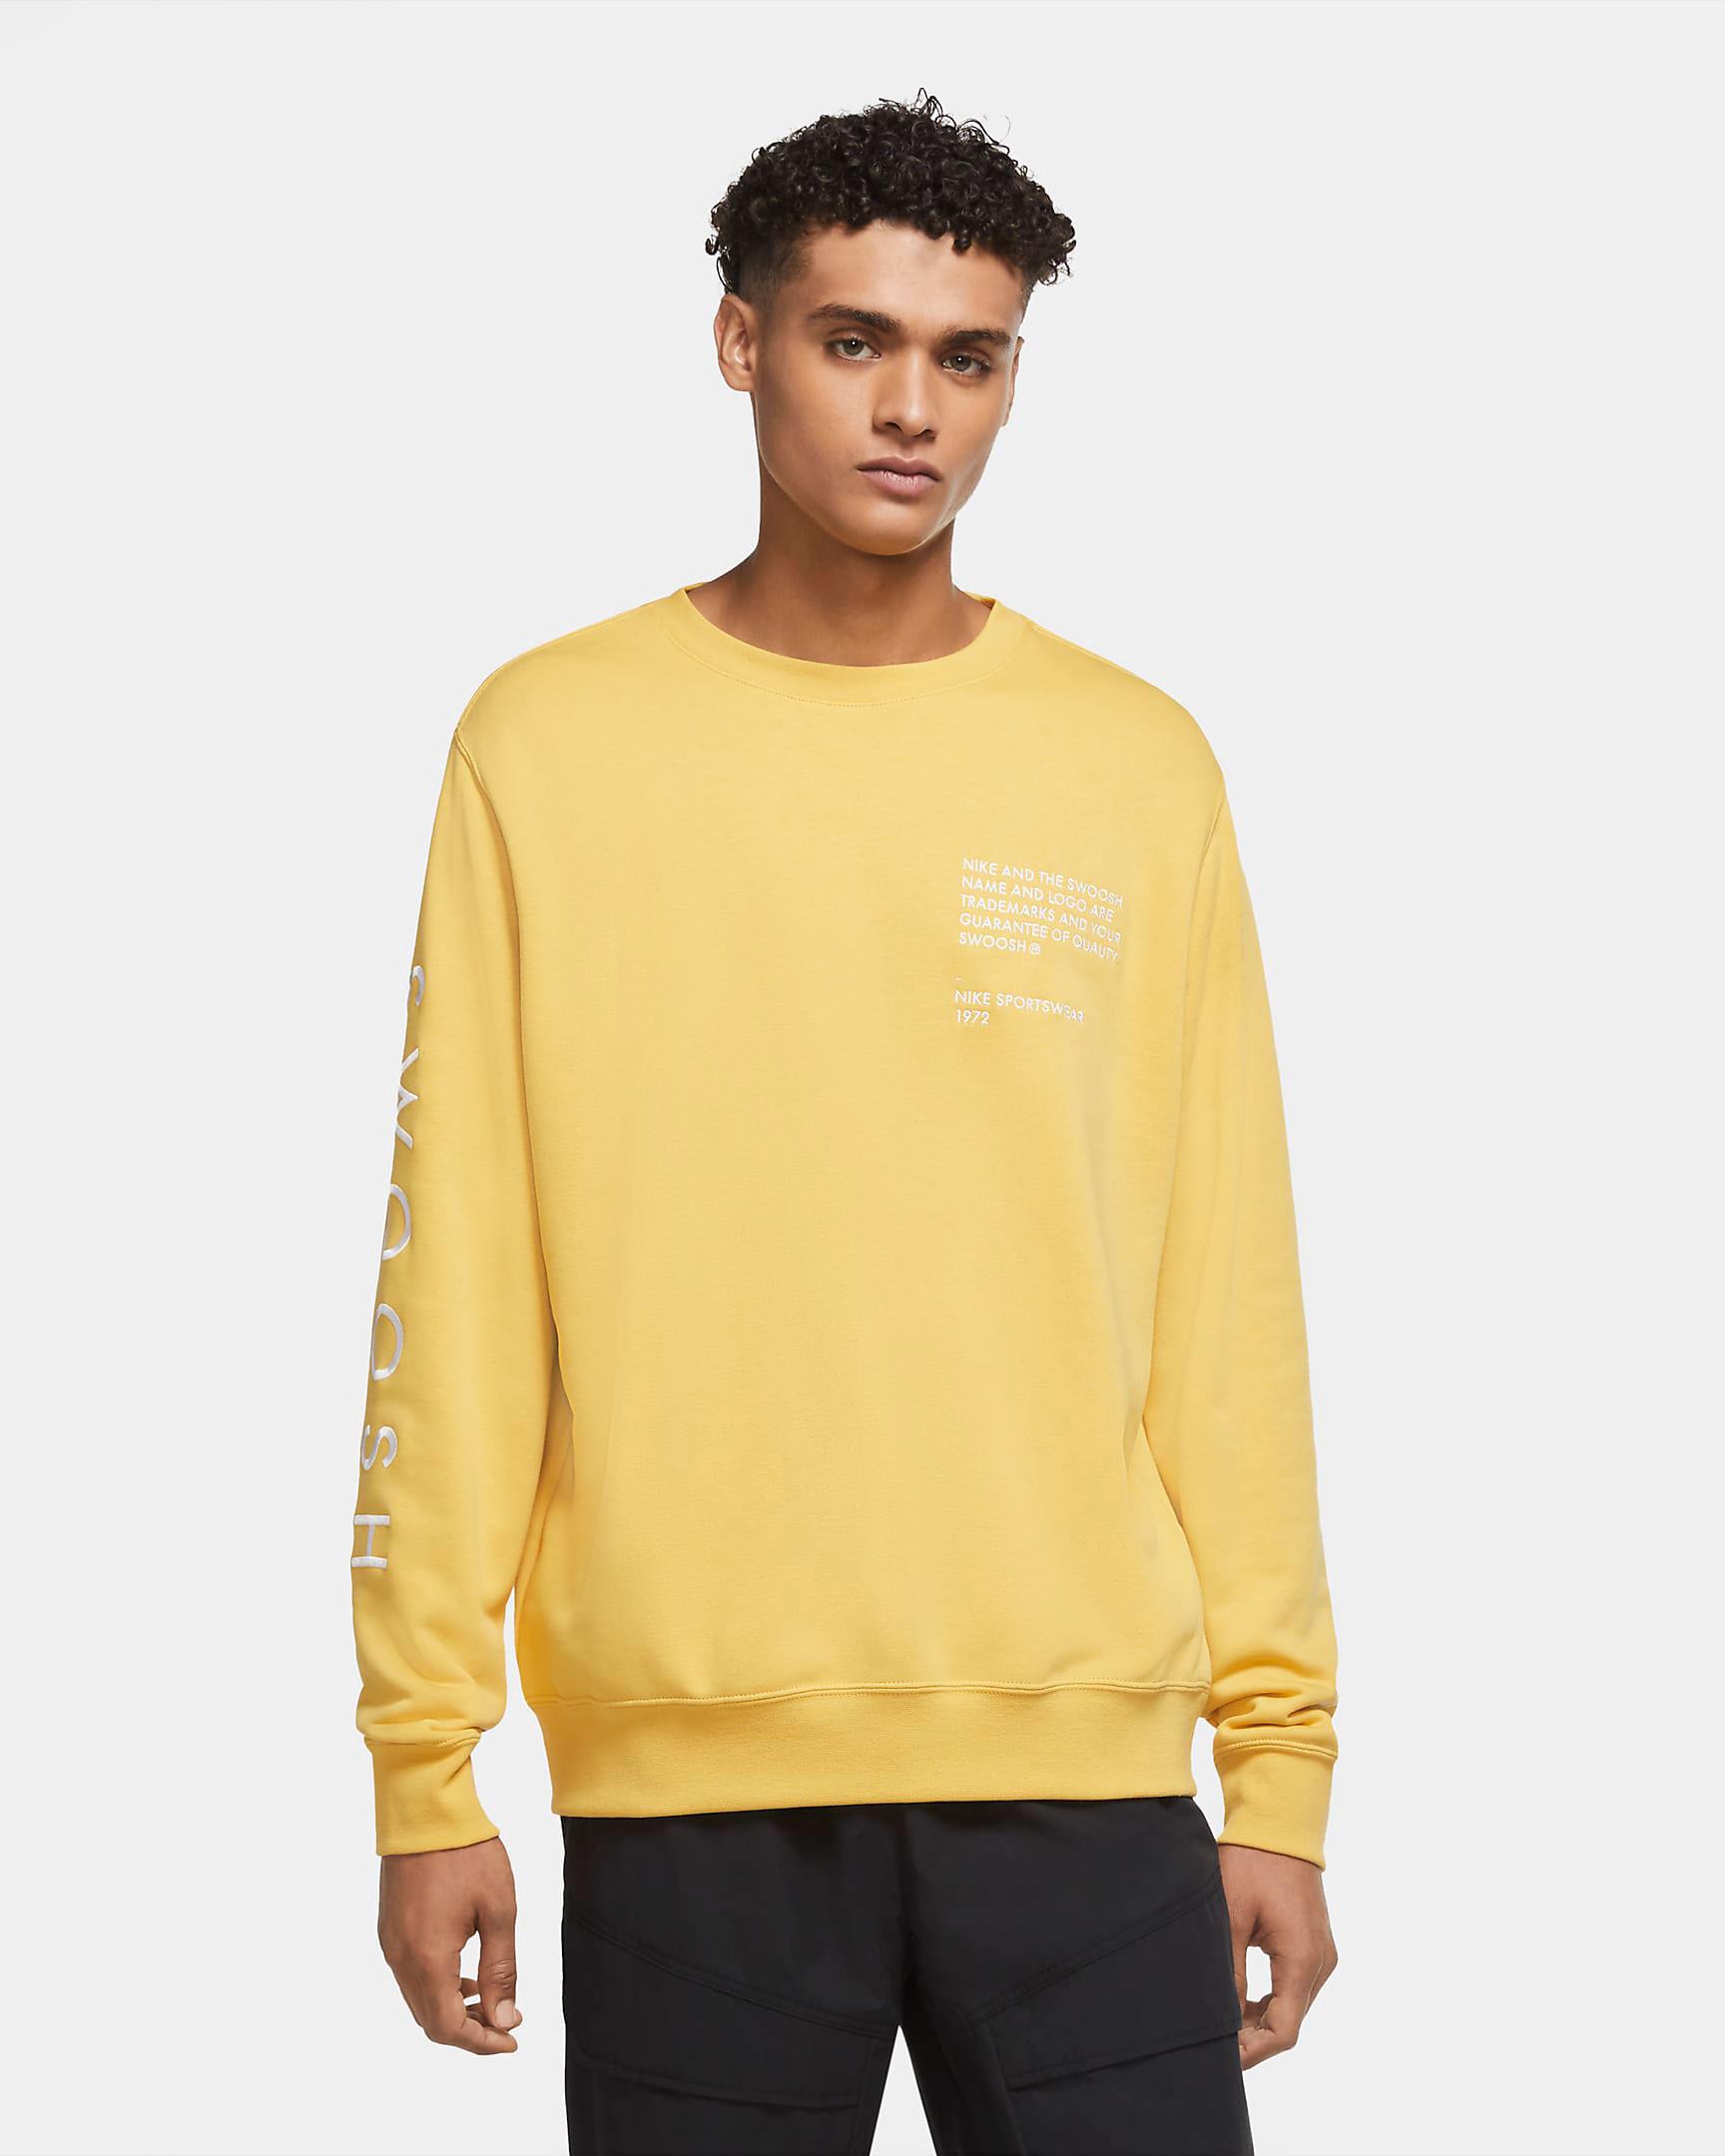 nike-air-max-1-lemonade-sweatshirt-match-1